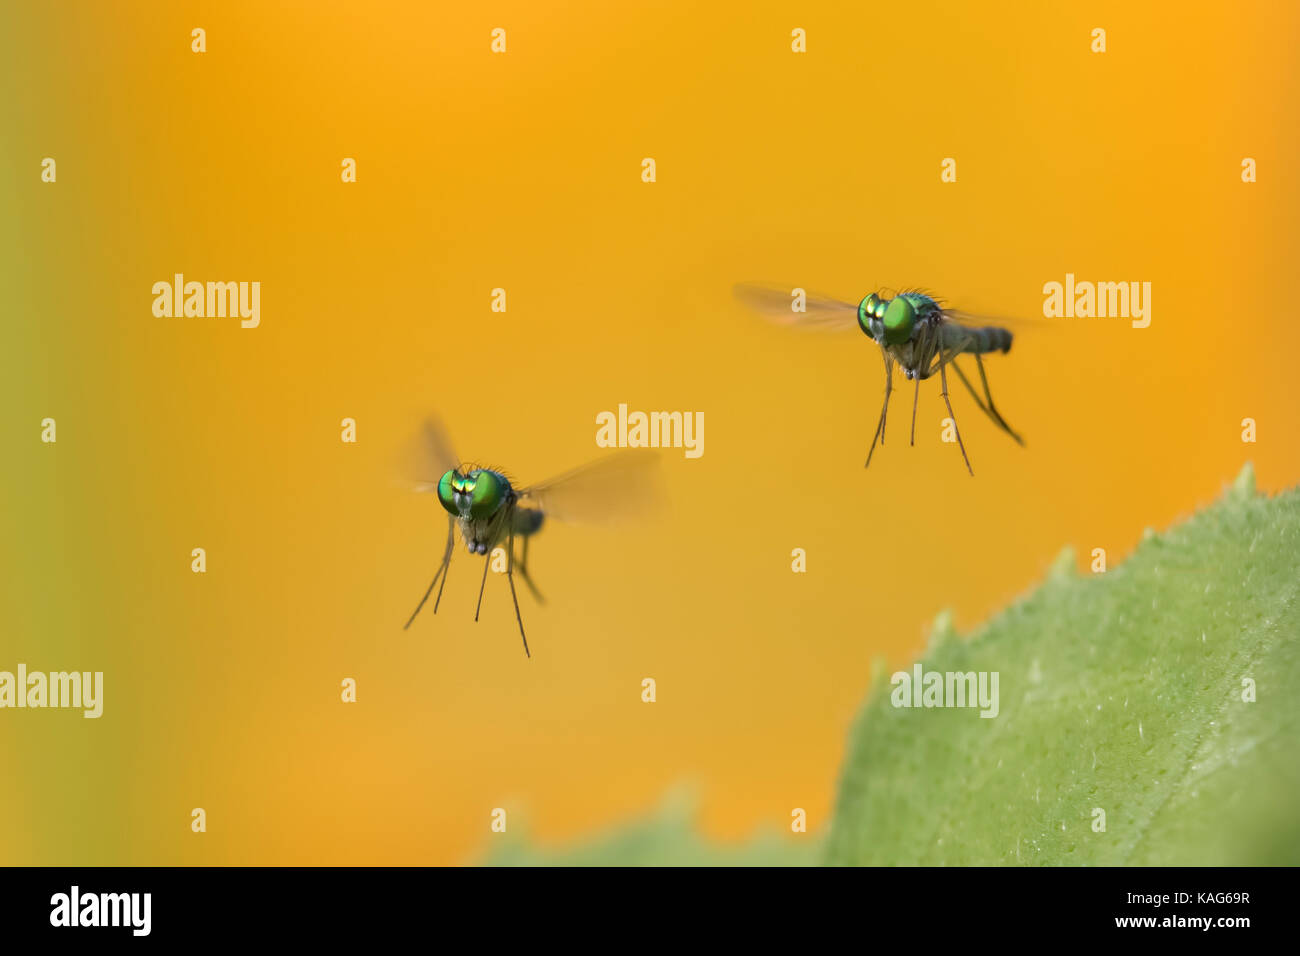 long-legged flie, Condylostylus genus in flight Stock Photo